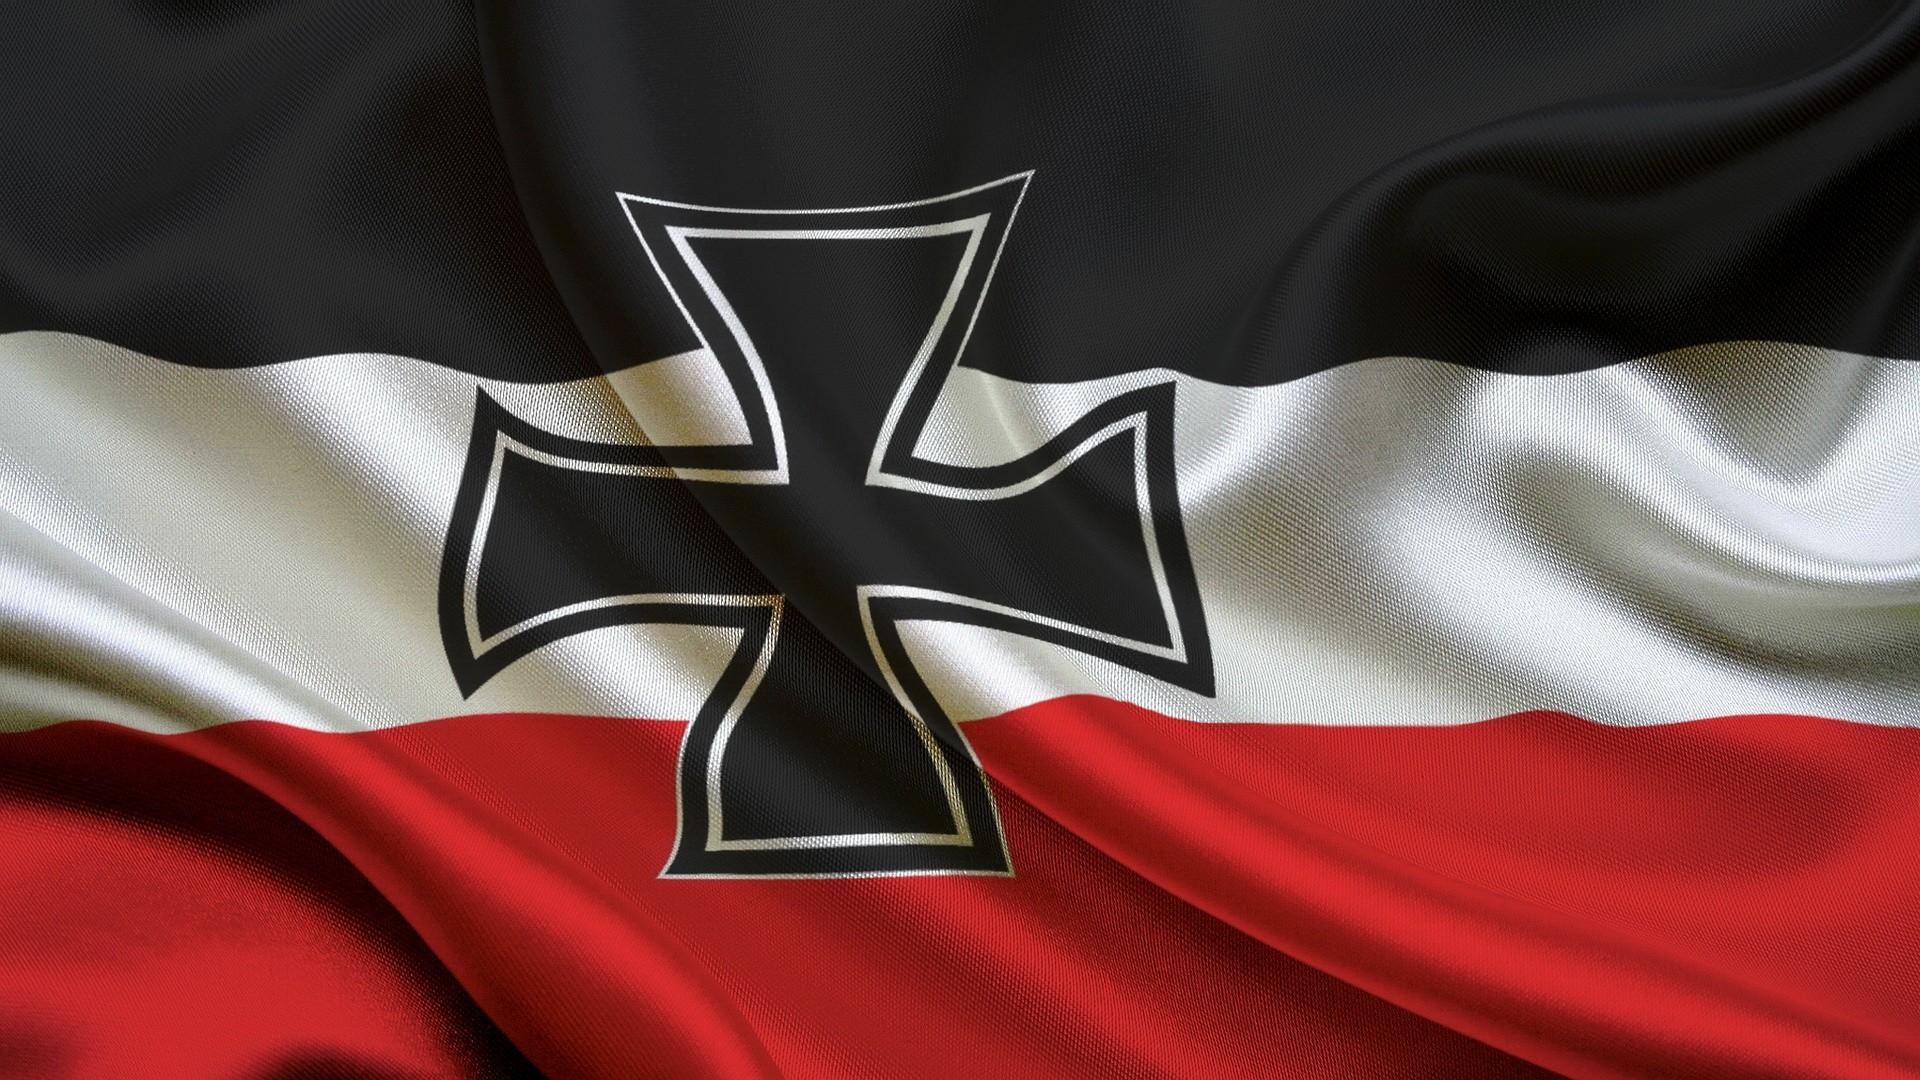 Confederate Flag Wallpaper Hd Die 87 Besten Deutschland Flagge Wallpapers